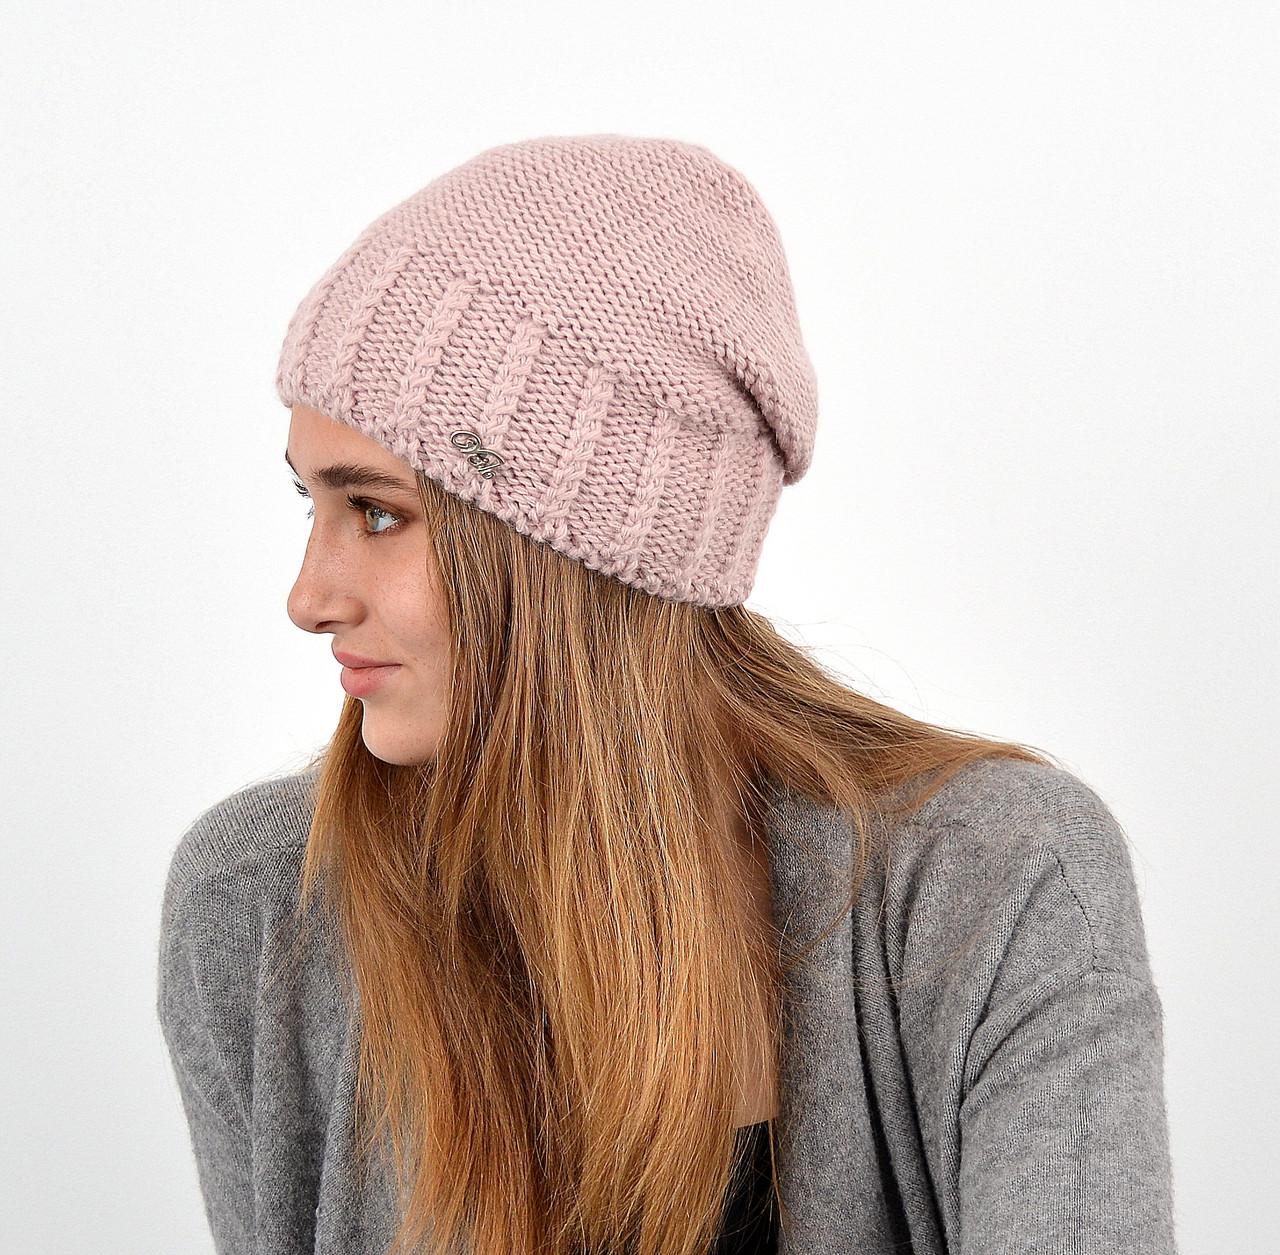 Женская шапка veilo на флисе 3417 пудра